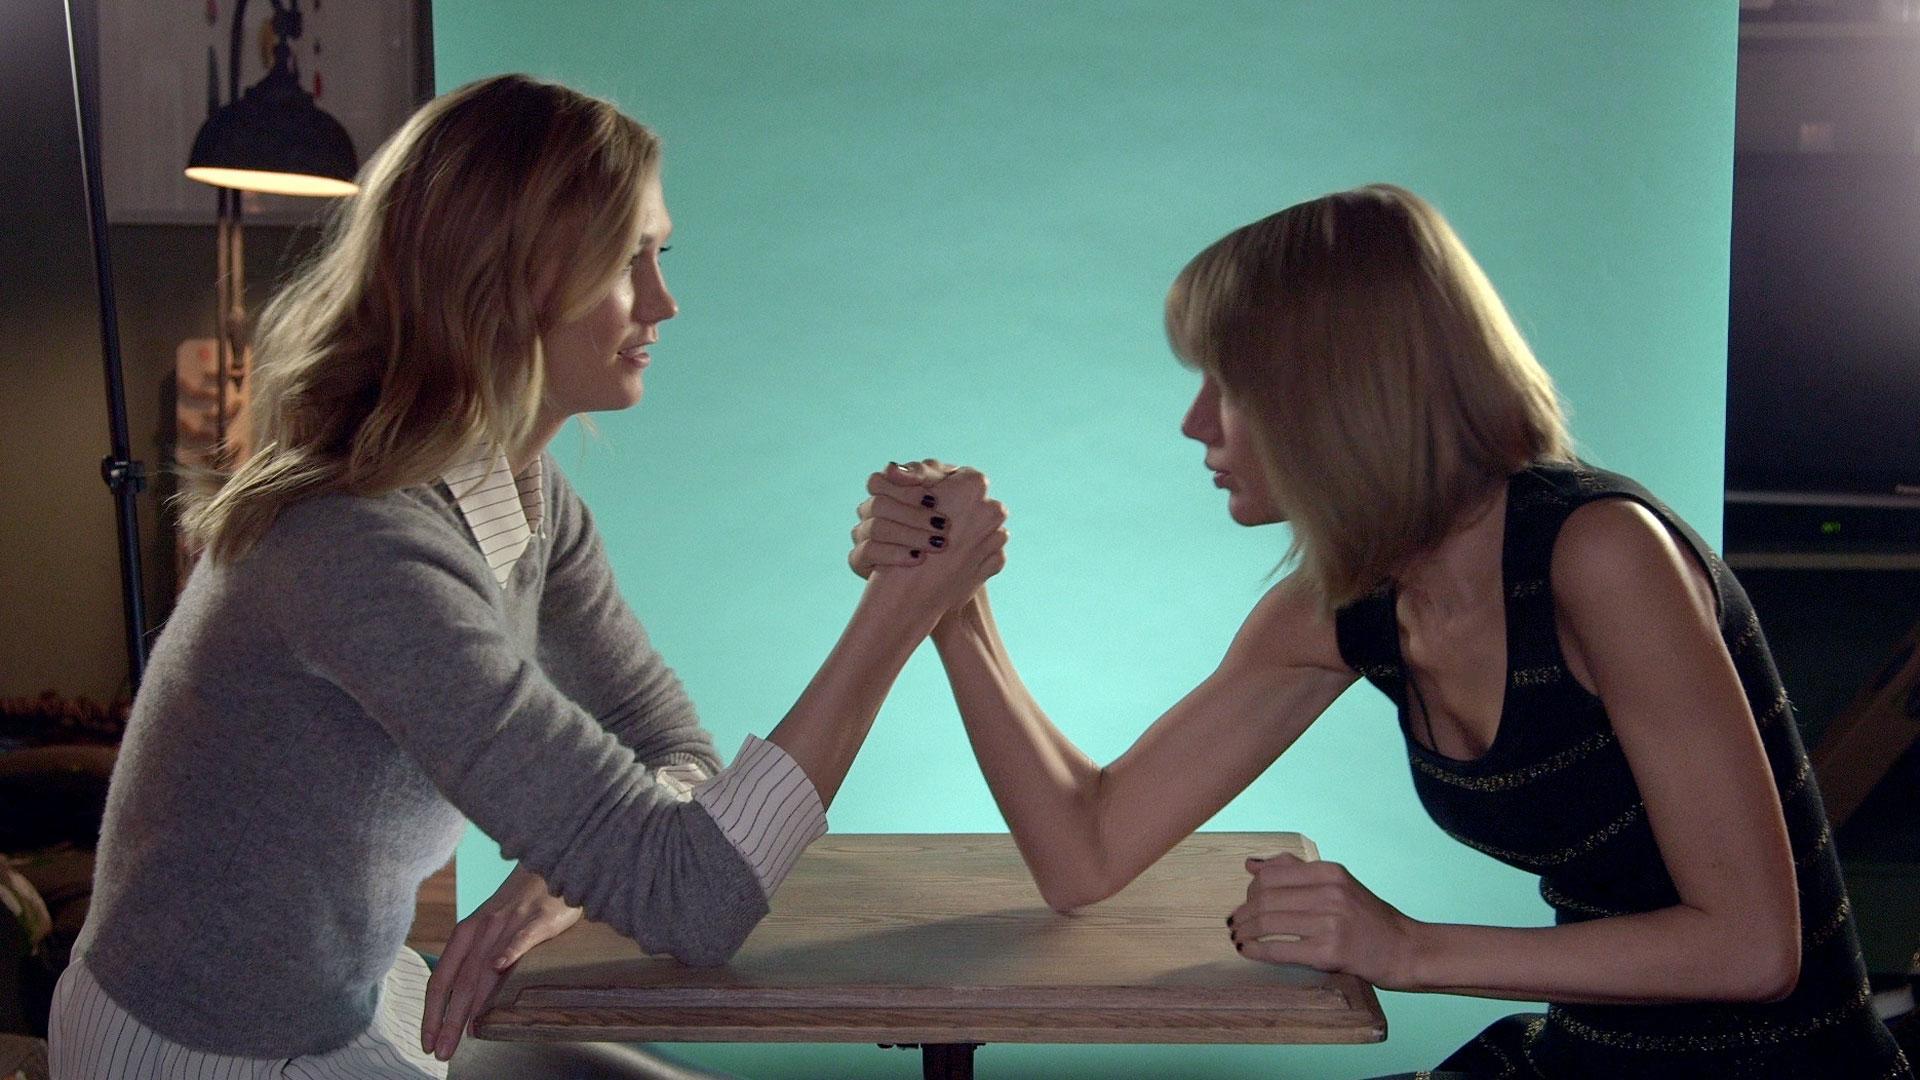 Taylor Swift vs. Karlie Kloss: Who's the Best Best Friend?